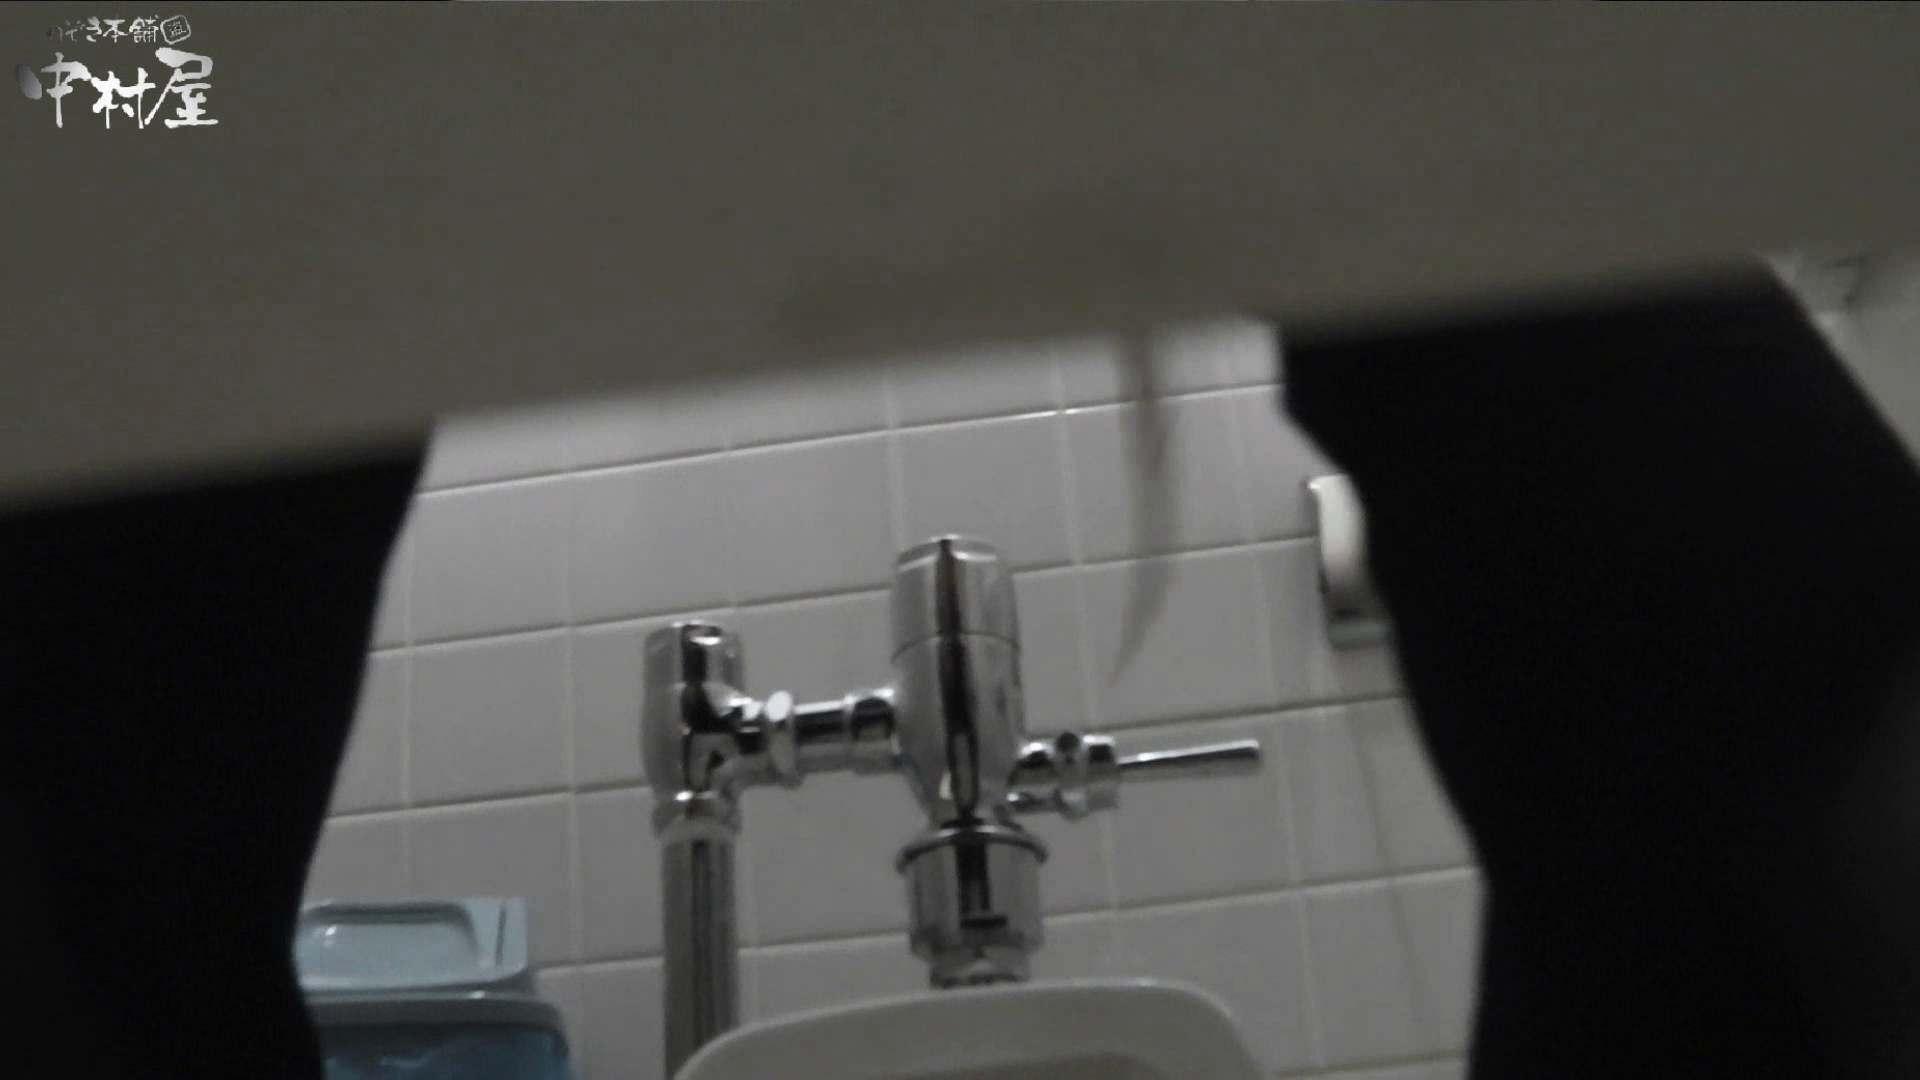 vol.31 命がけ潜伏洗面所! 半出しして諦めるポニテさん後編 プライベート オメコ無修正動画無料 89pic 7